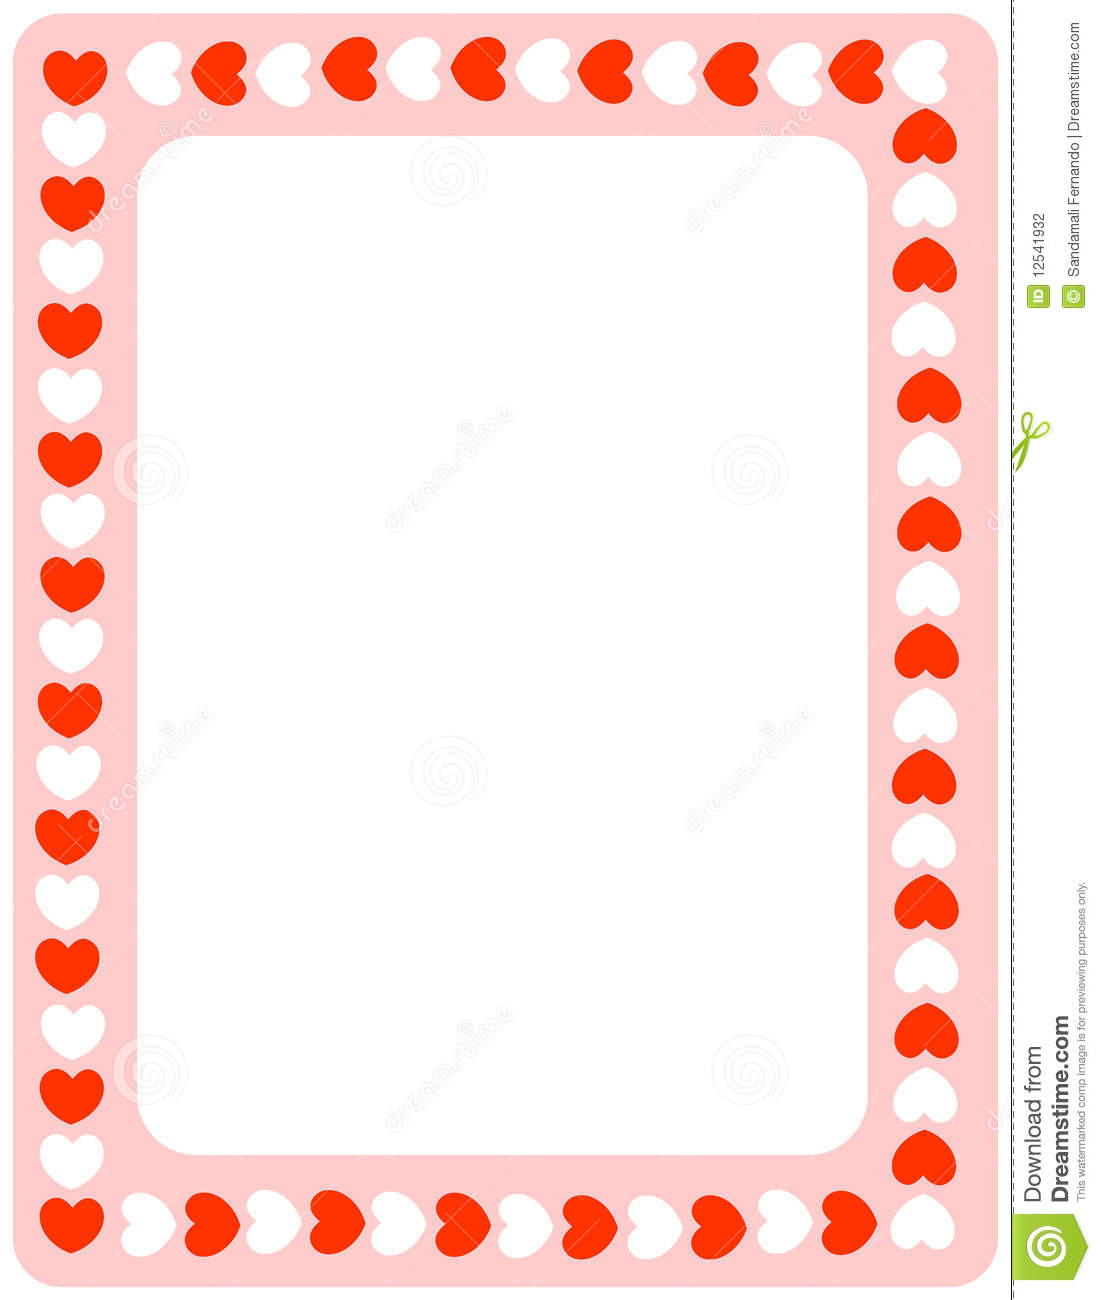 Valentine Heart Border Clipart Red Hearts Valentines Day